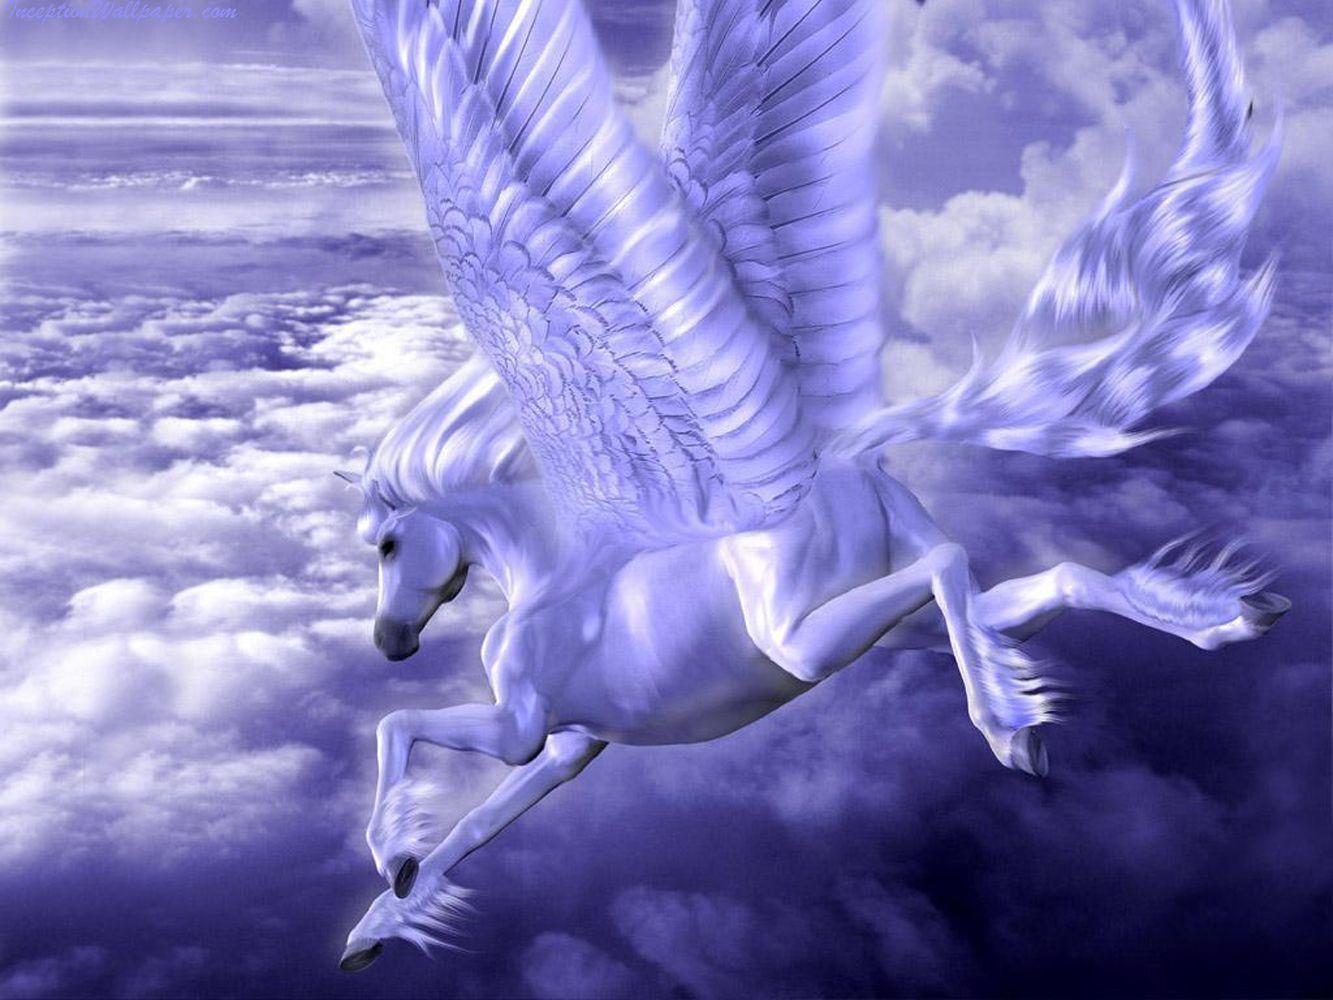 Cool Wallpaper Horse Unicorn - d57f645141c7cf826c88a8ce2f15974a  Snapshot_854848.jpg